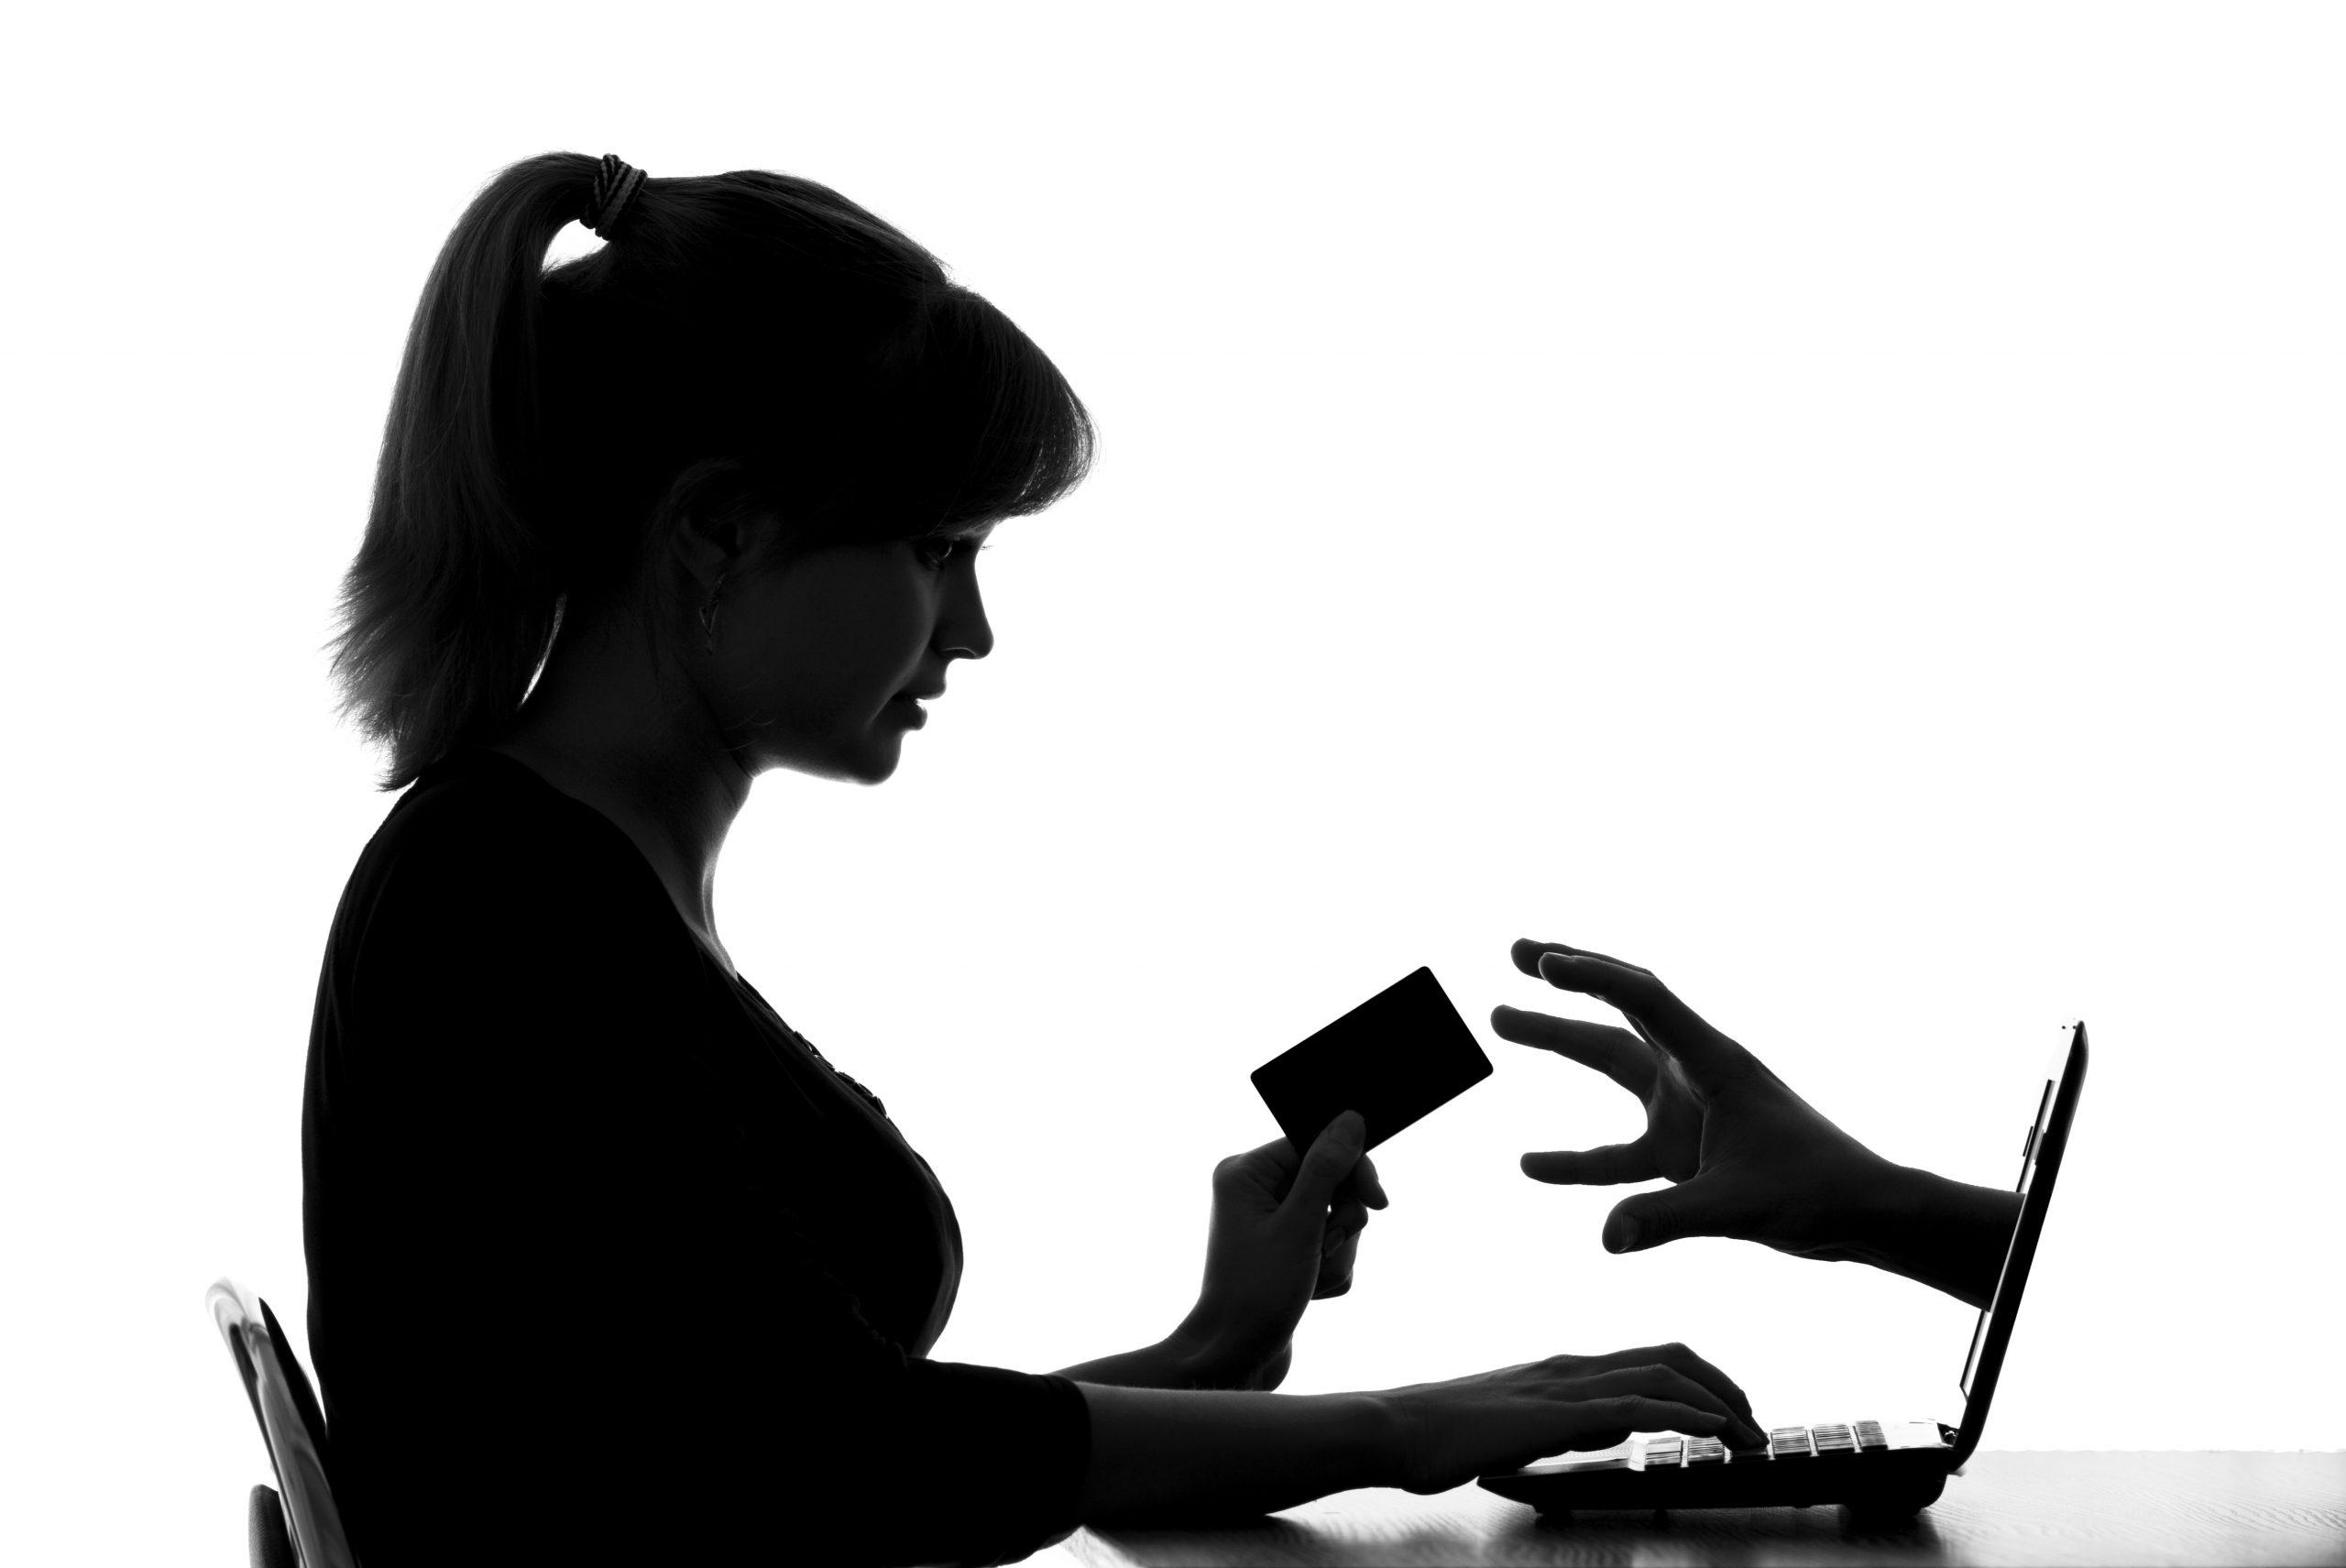 siber saldırı attack kredi kart